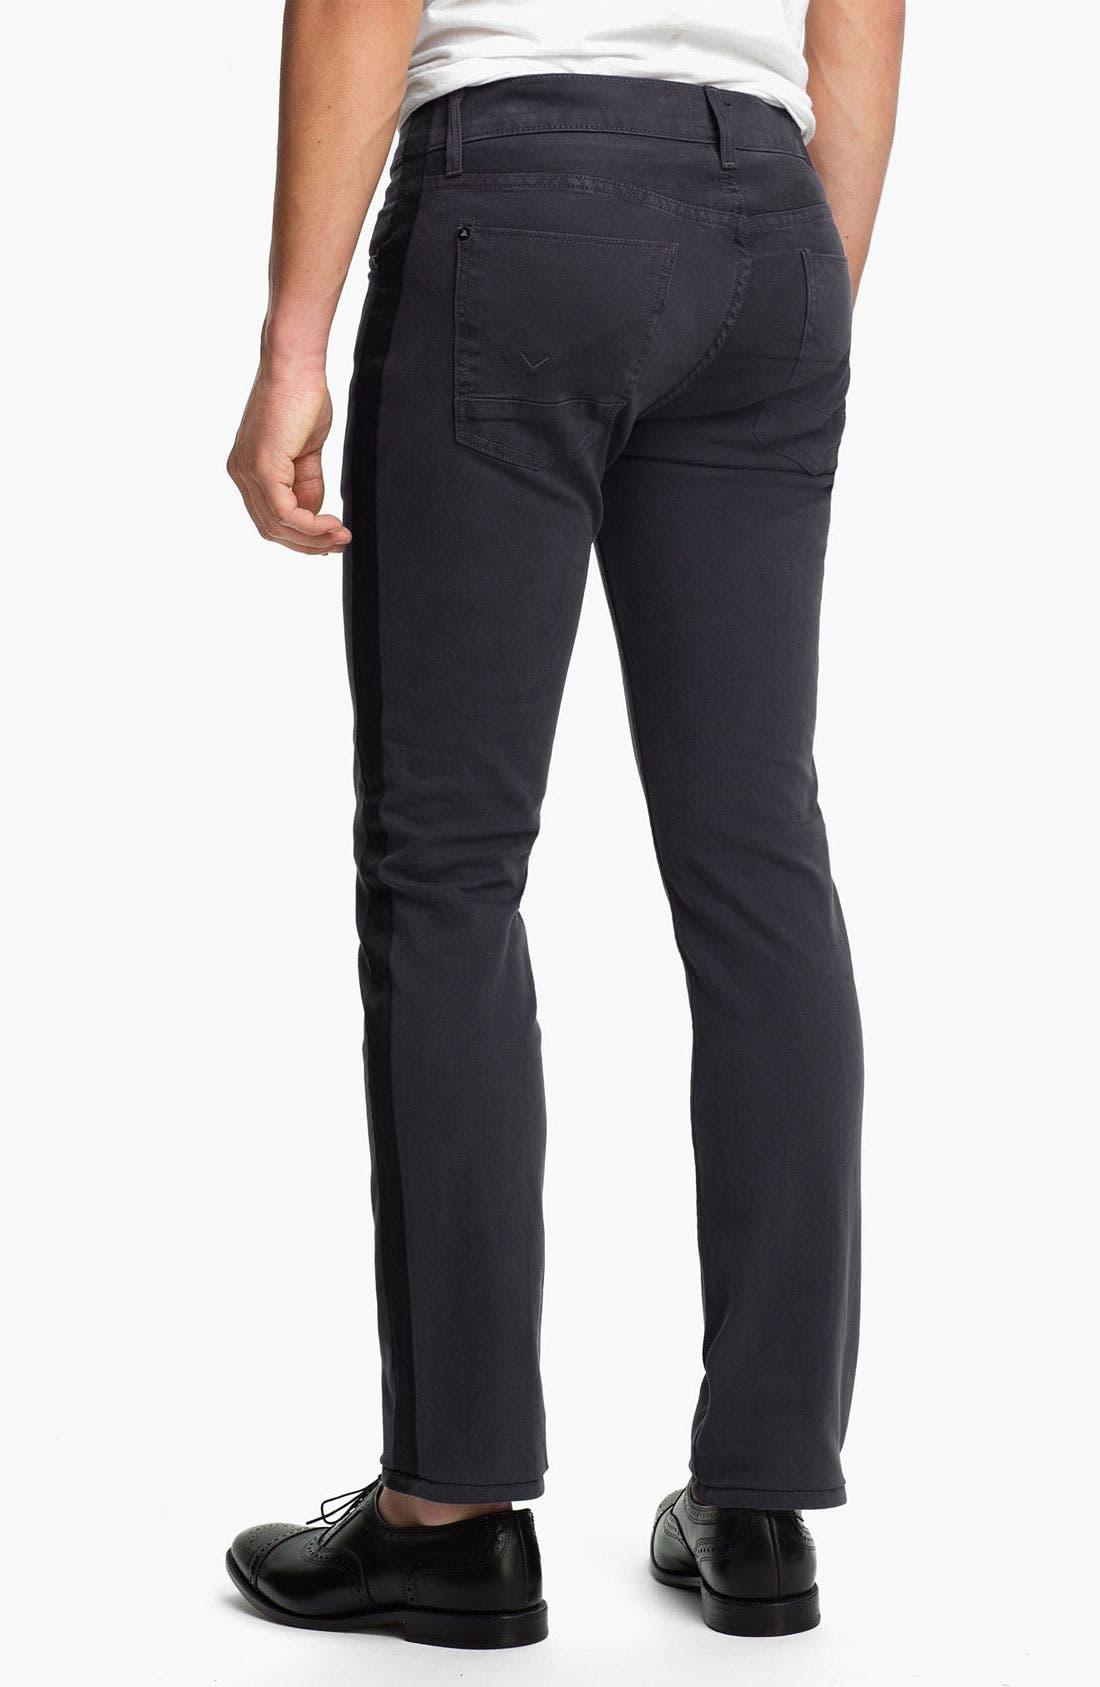 Alternate Image 1 Selected - Hudson Jeans 'Lou Tuxedo' Slim Straight Leg Jeans (Incognito)